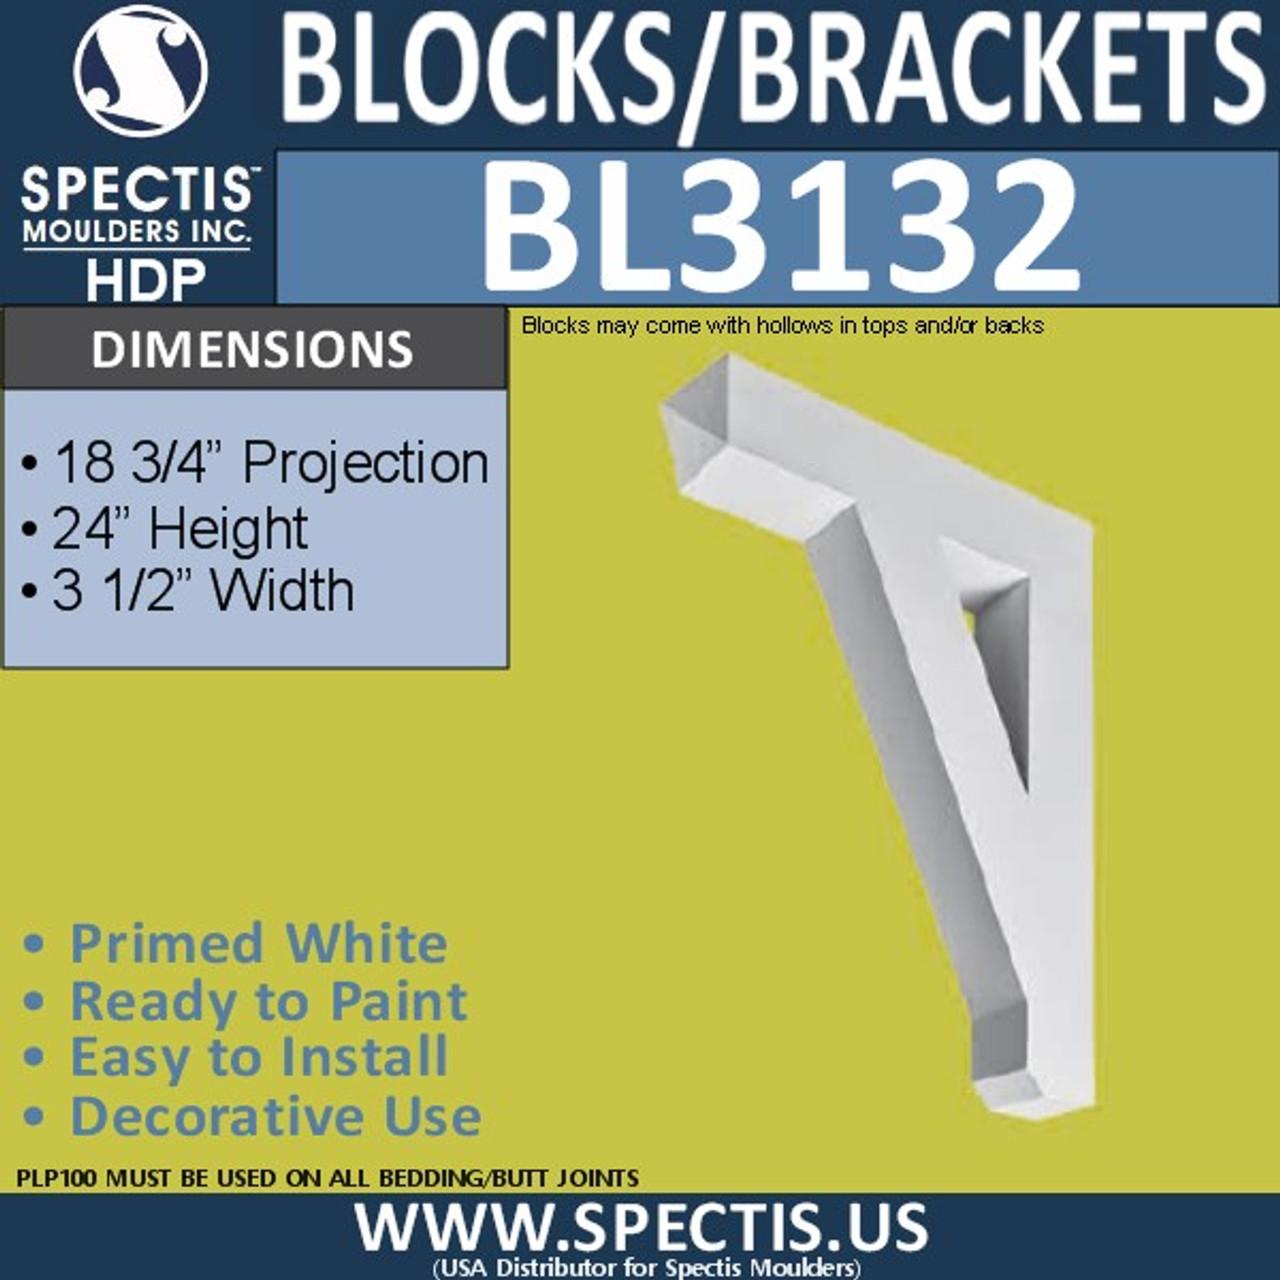 "BL3132 Eave Block or Bracket 3.5""W x 24""H x 18.75""P"